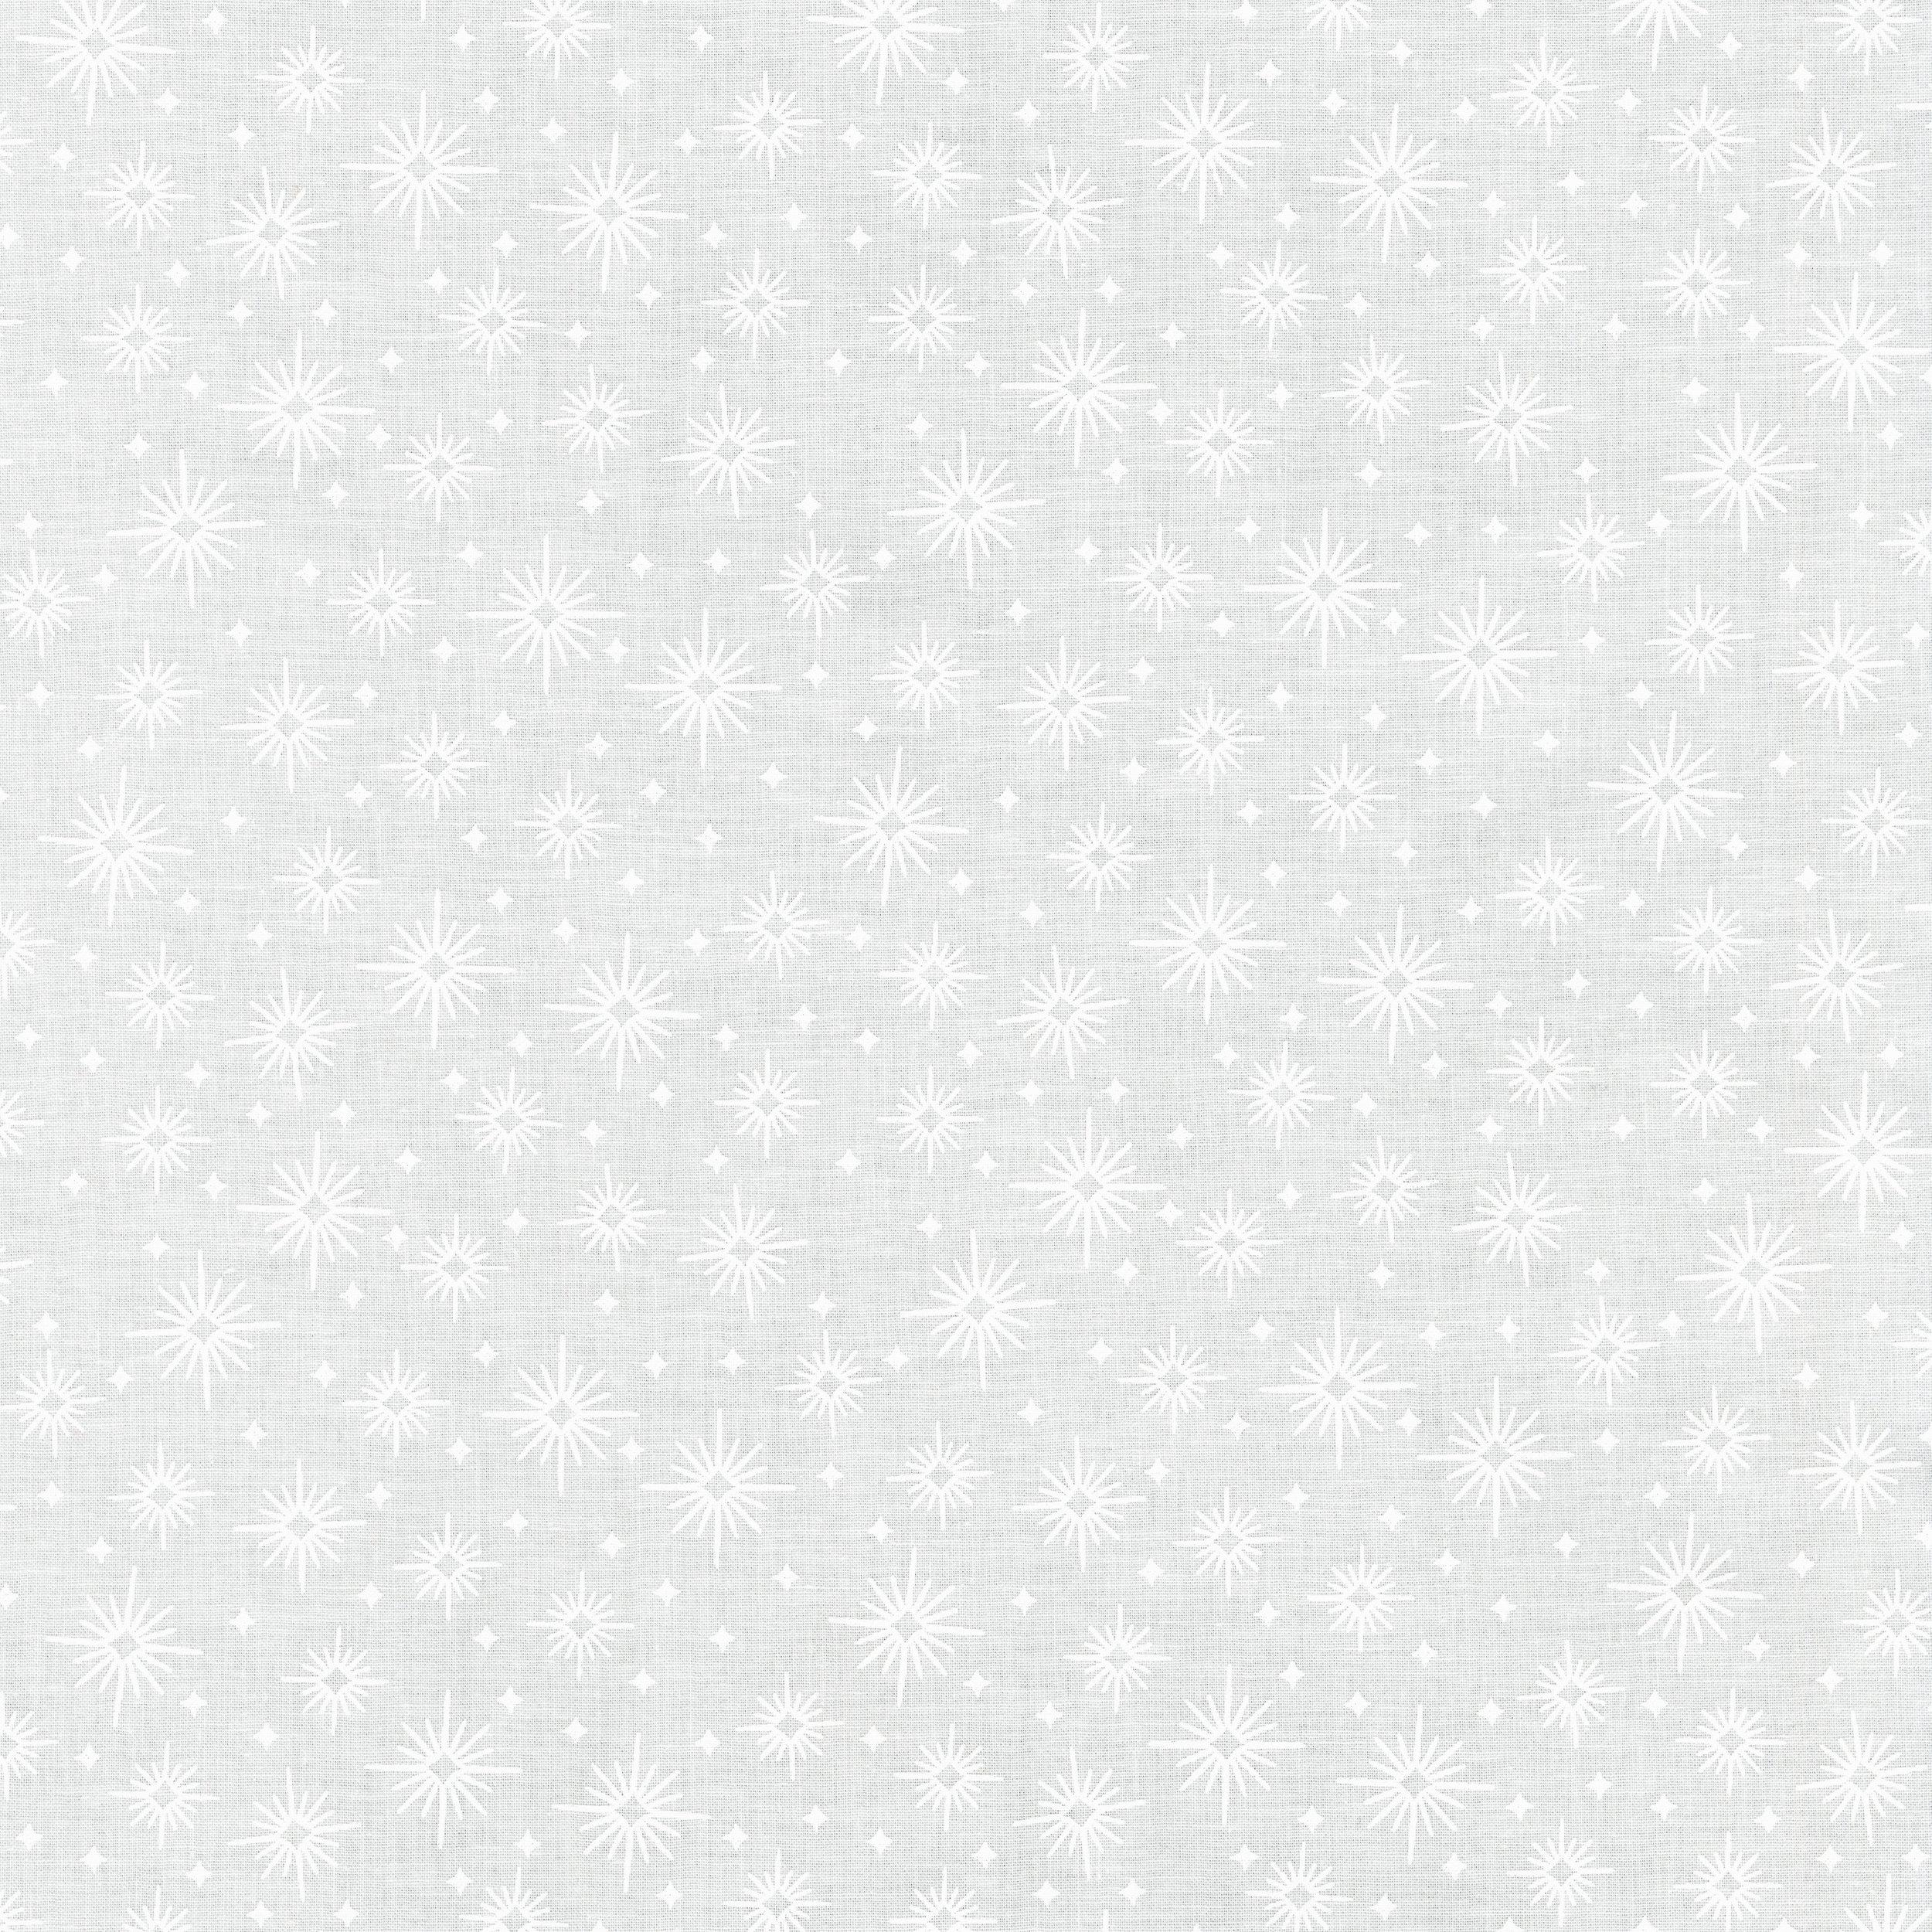 AVL-18156-1 Starlight WHITE